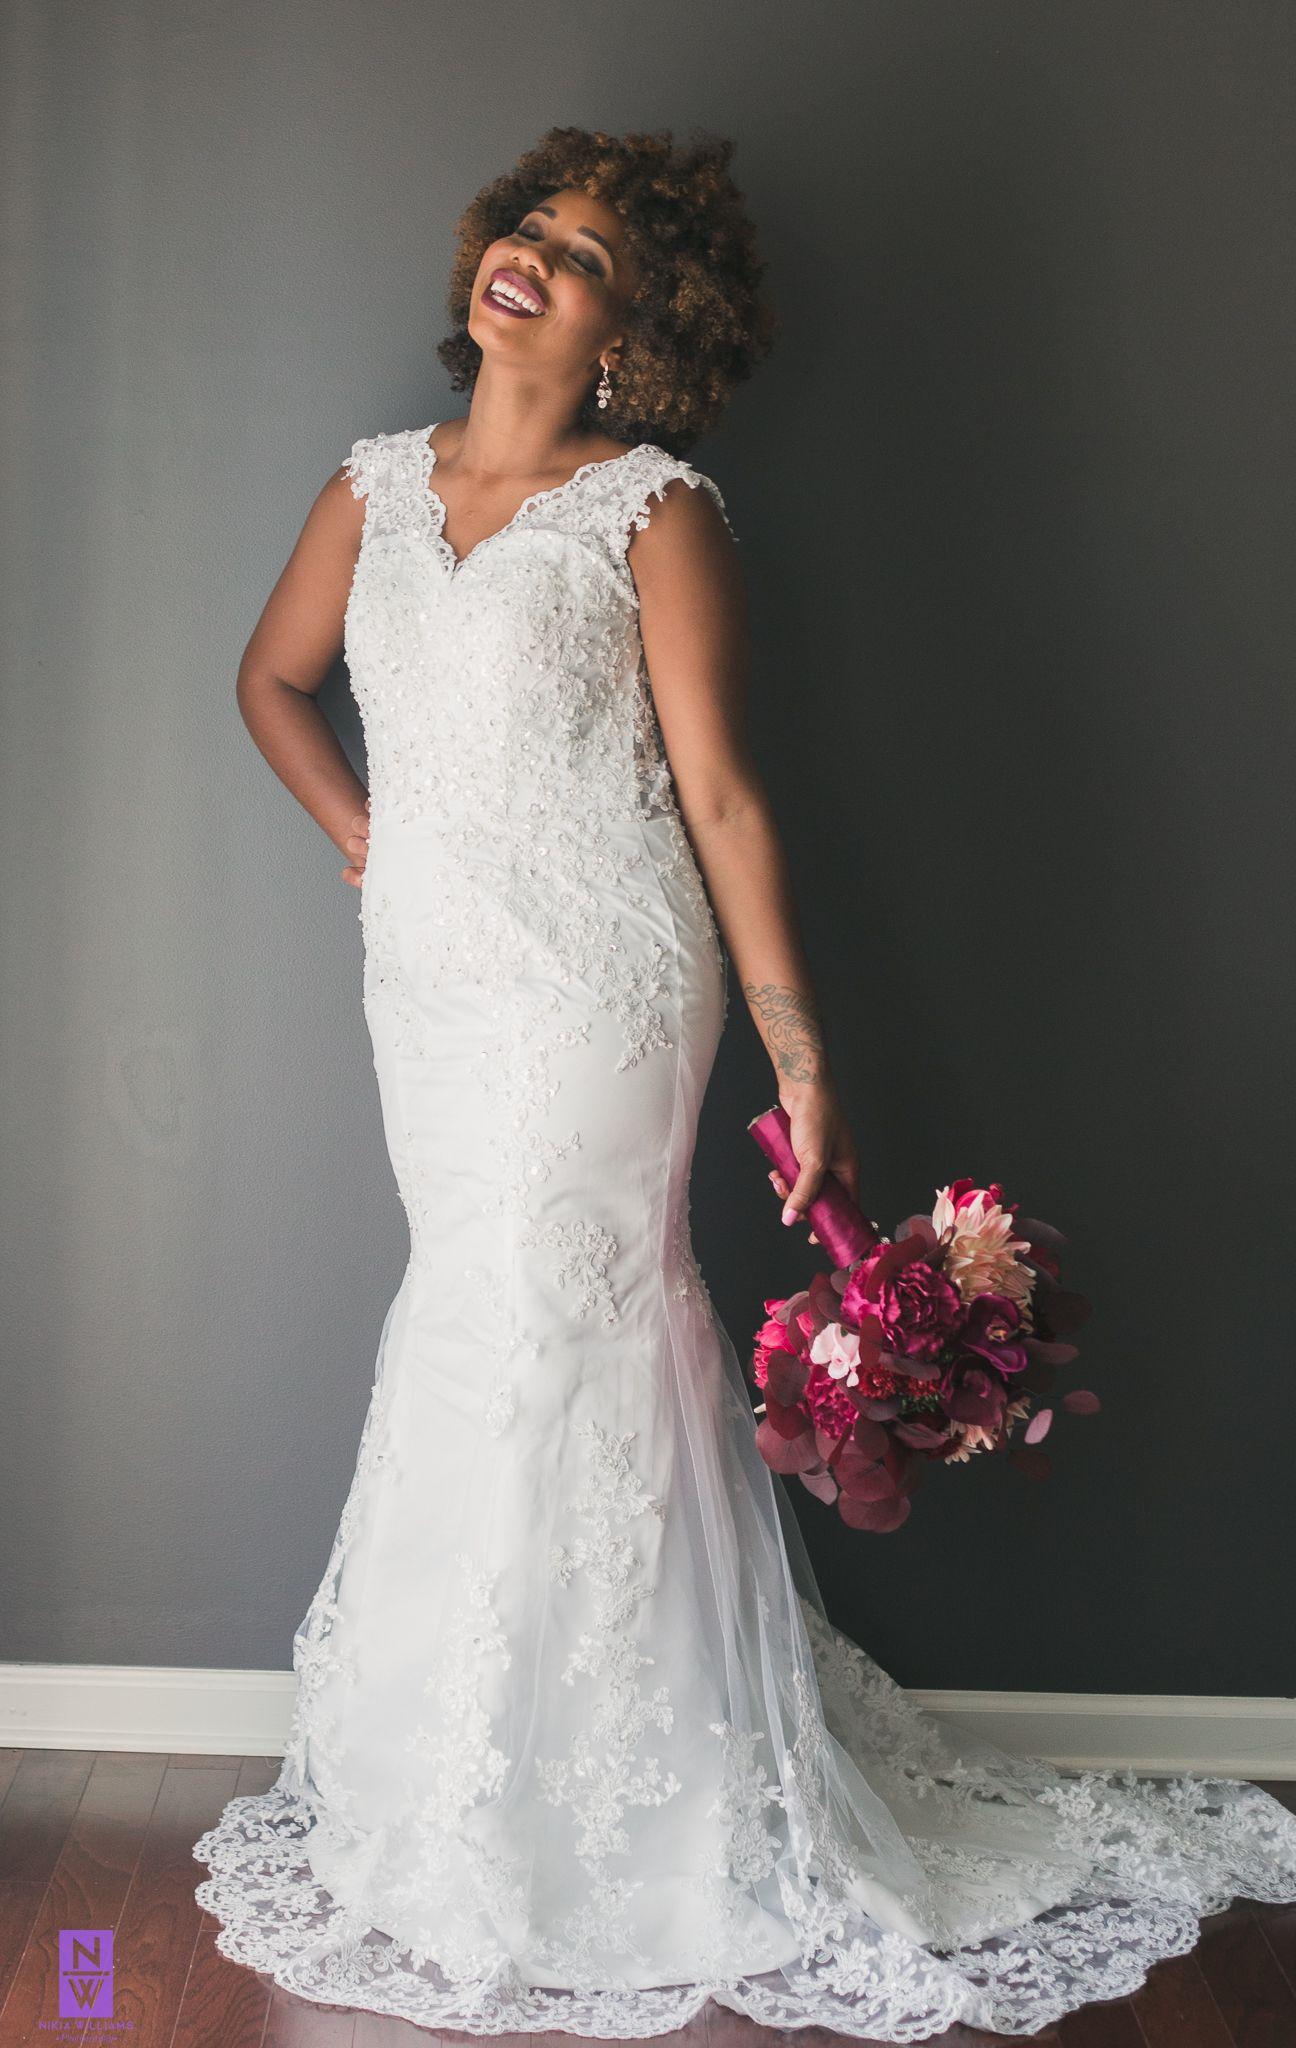 Southern belle wedding dresses  Nikia Williams Photography Charlotte Wedding Photographer Durham